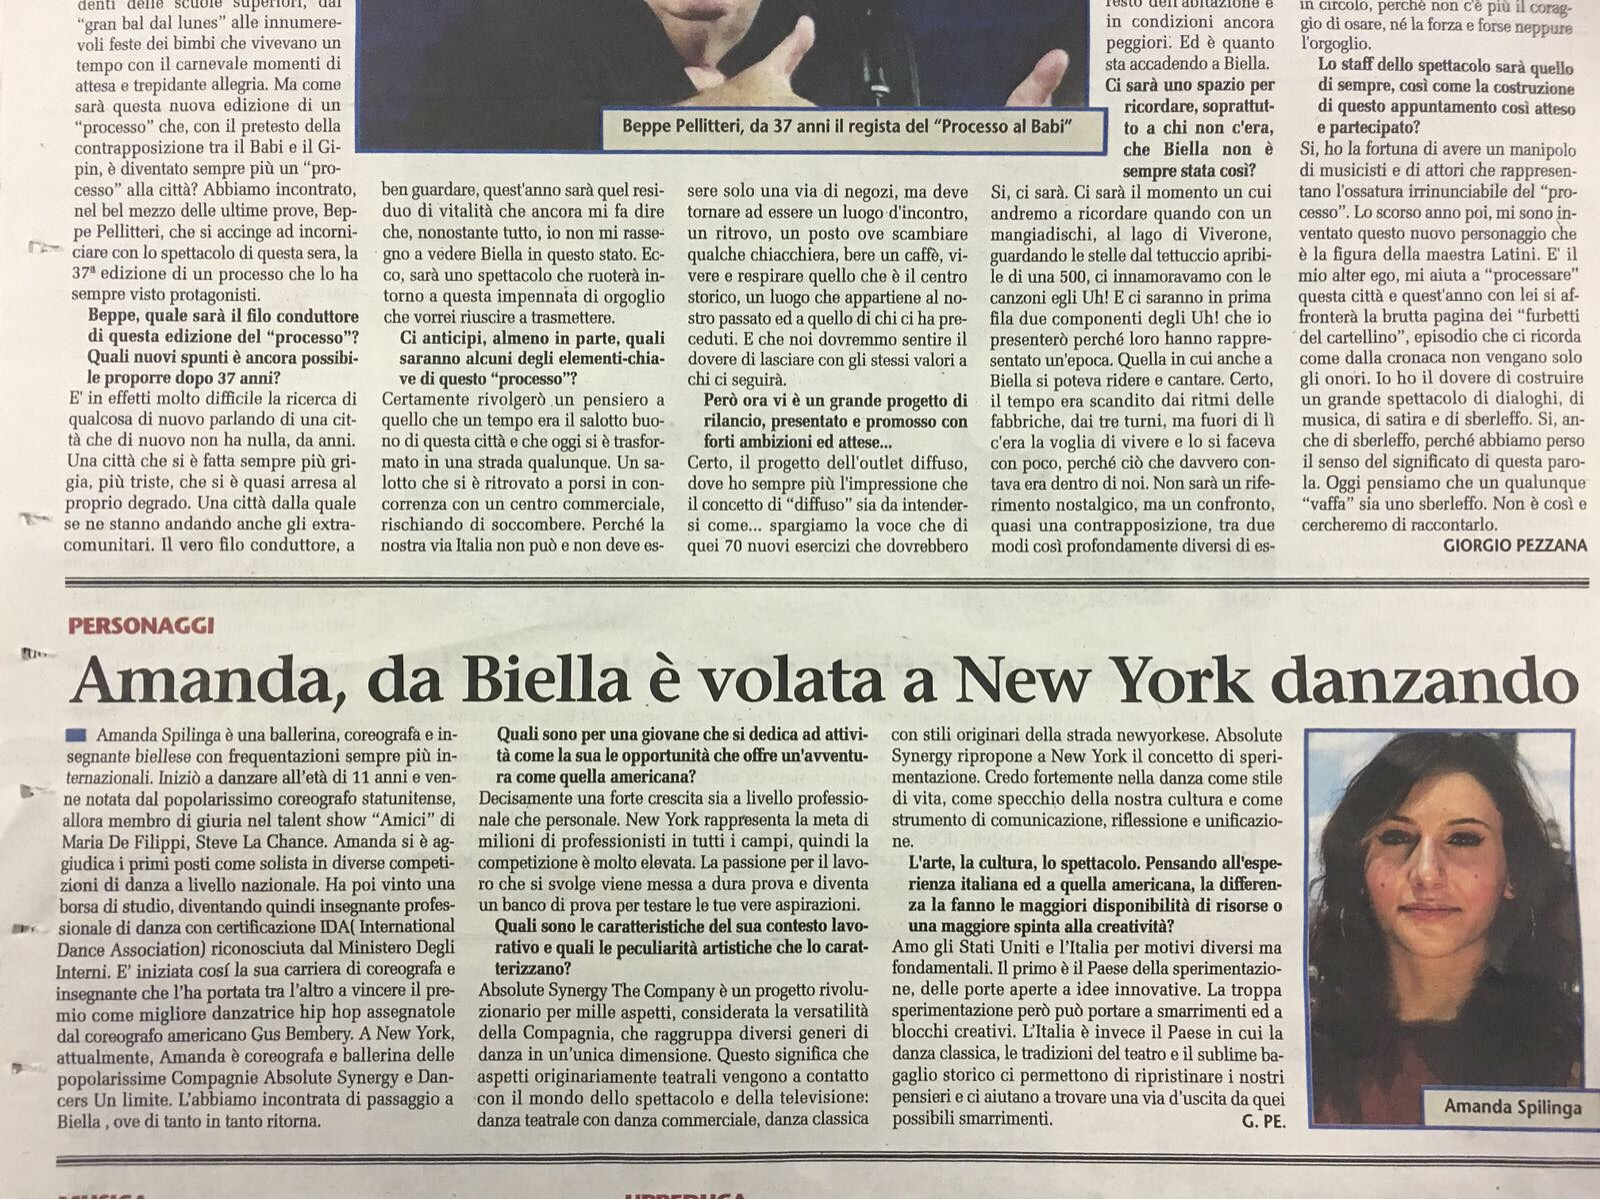 ASTC Italian article.JPG